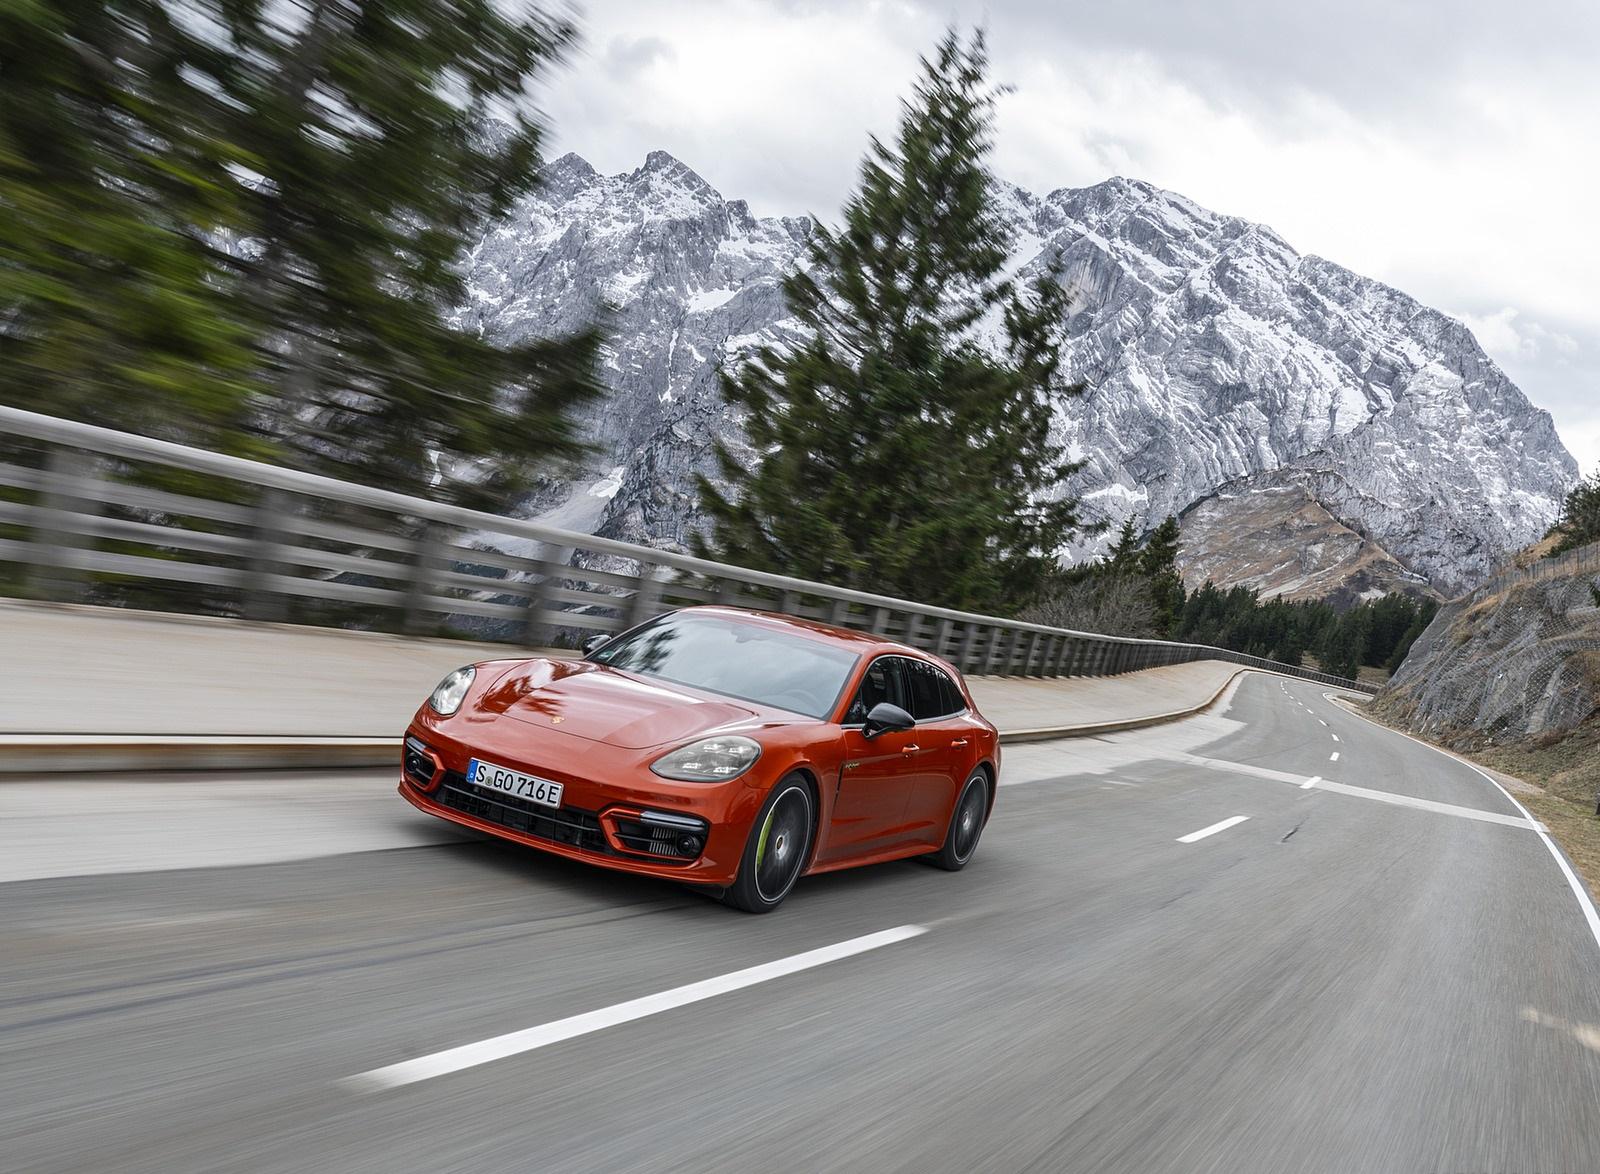 2021 Porsche Panamera 4 E-Hybrid Sport Turismo (Color: Papaya Metallic) Front Three-Quarter Wallpapers (10)